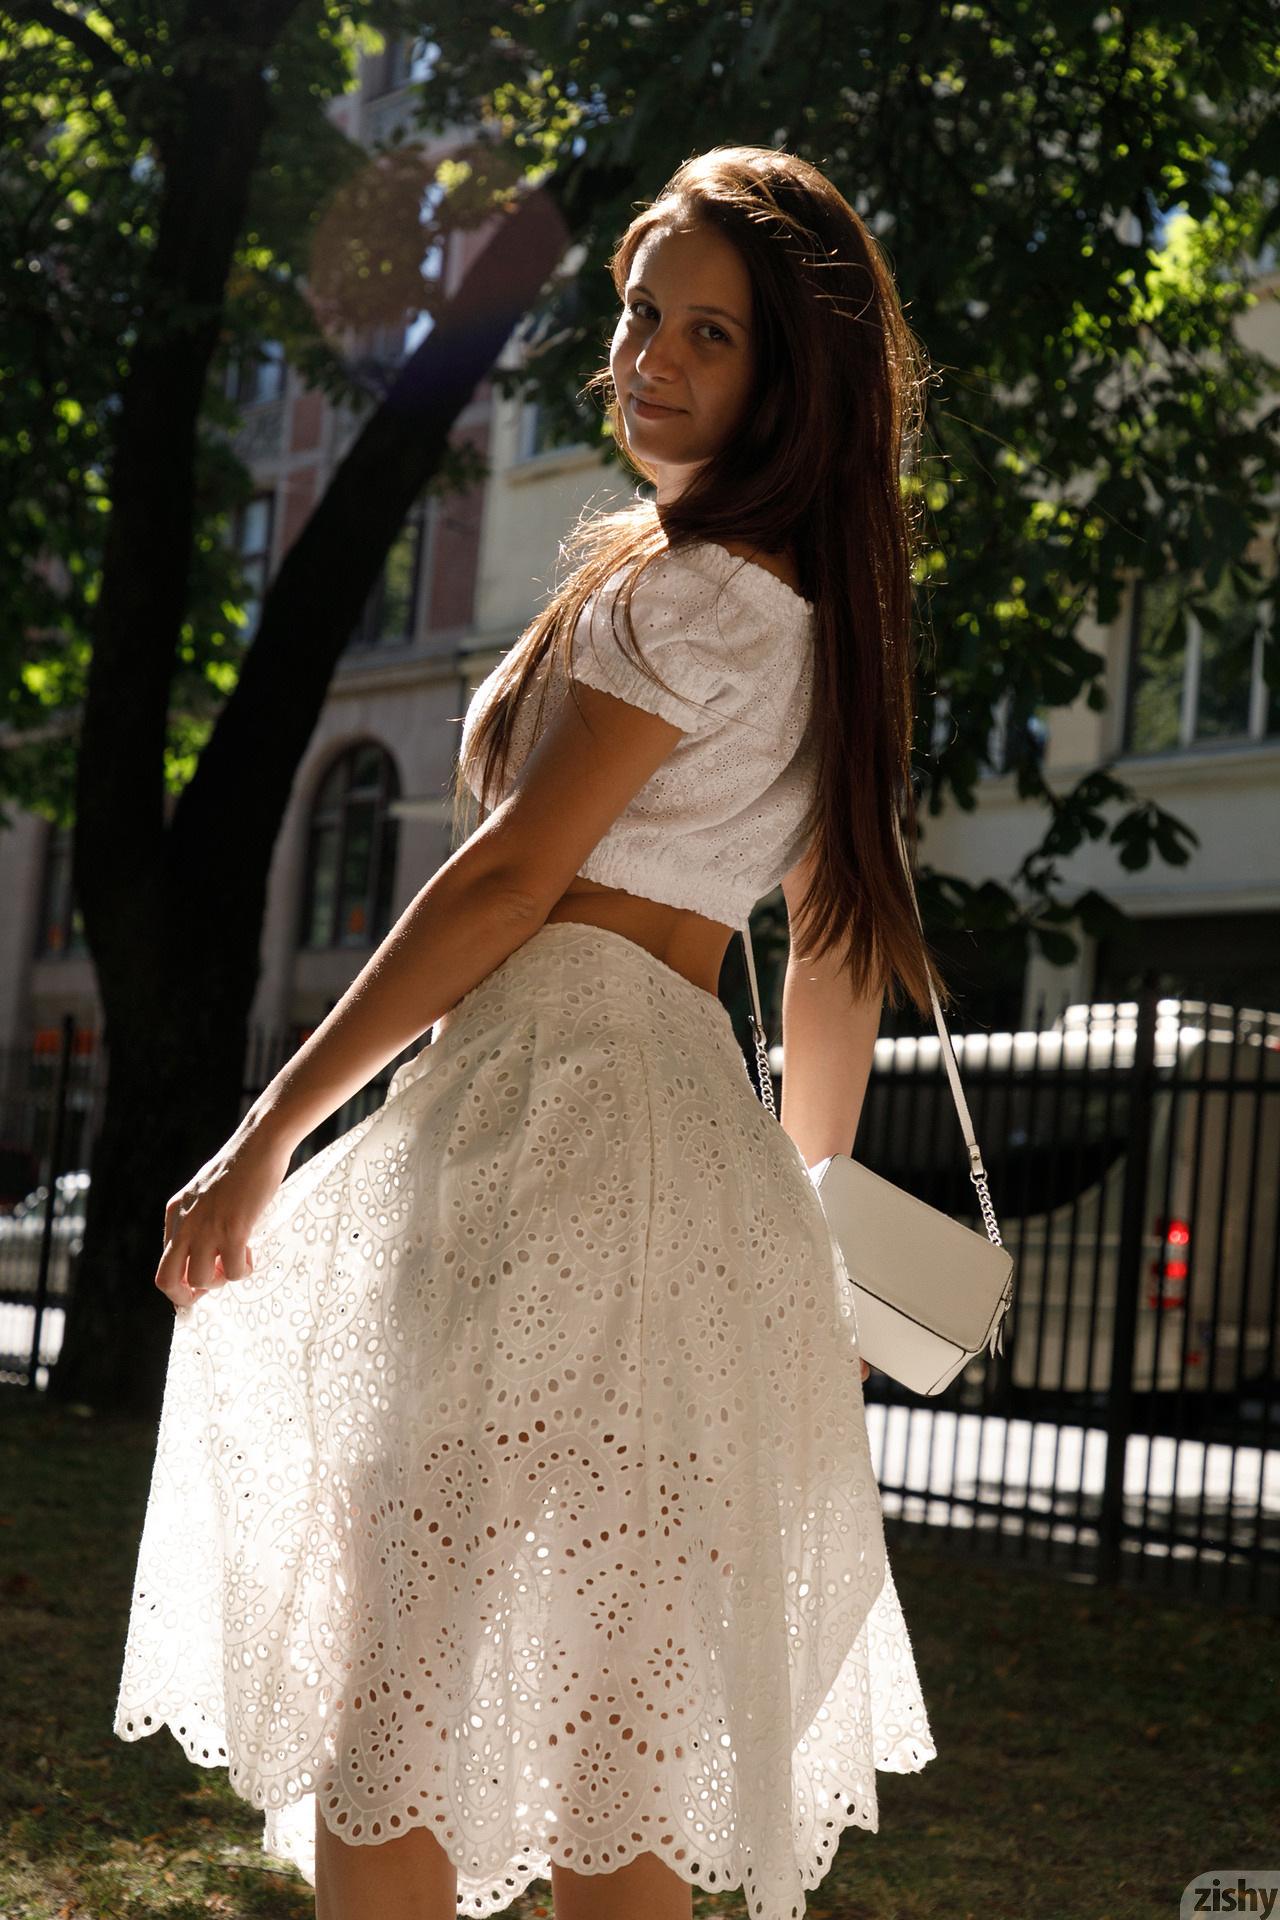 Jessica Albanka Melts Oslo Zishy (4)